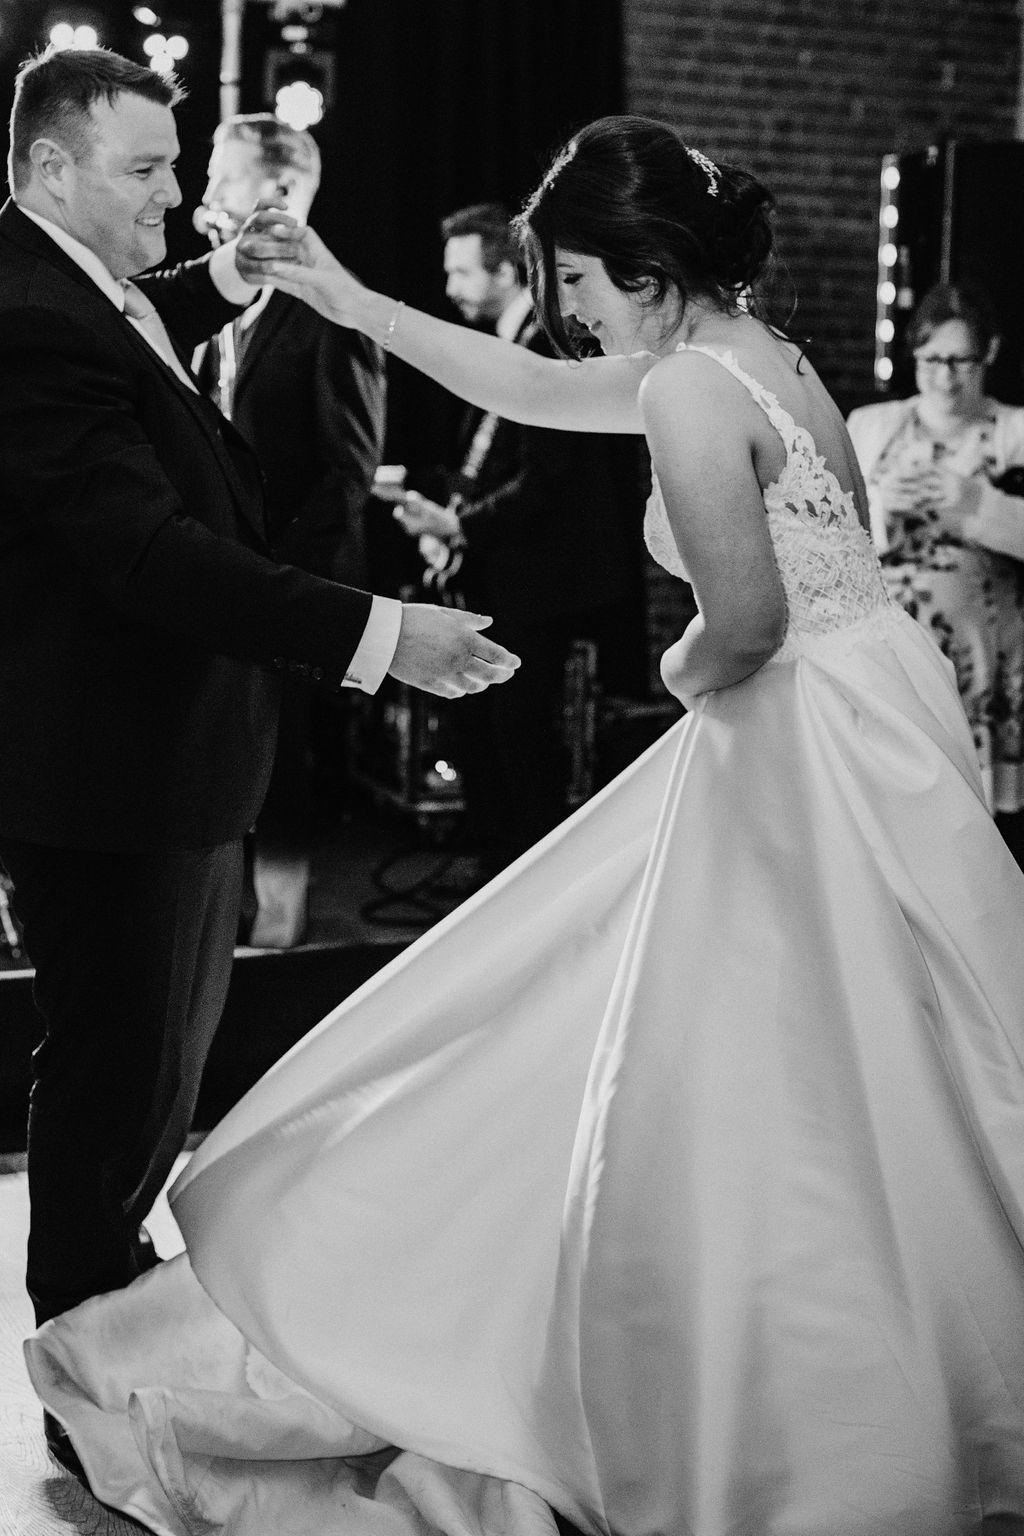 Your_Wedding_Day_622.jpg